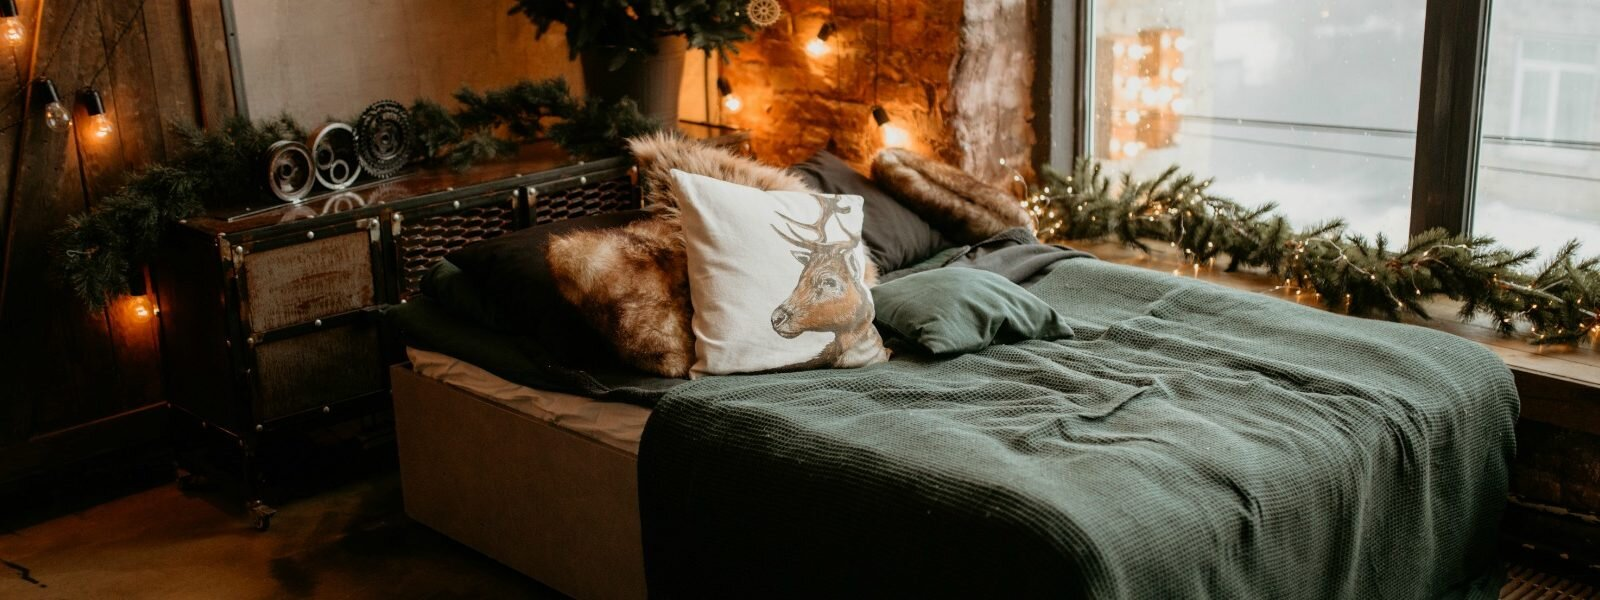 apartment-bed-bedroom-1879061-1600x600.jpg